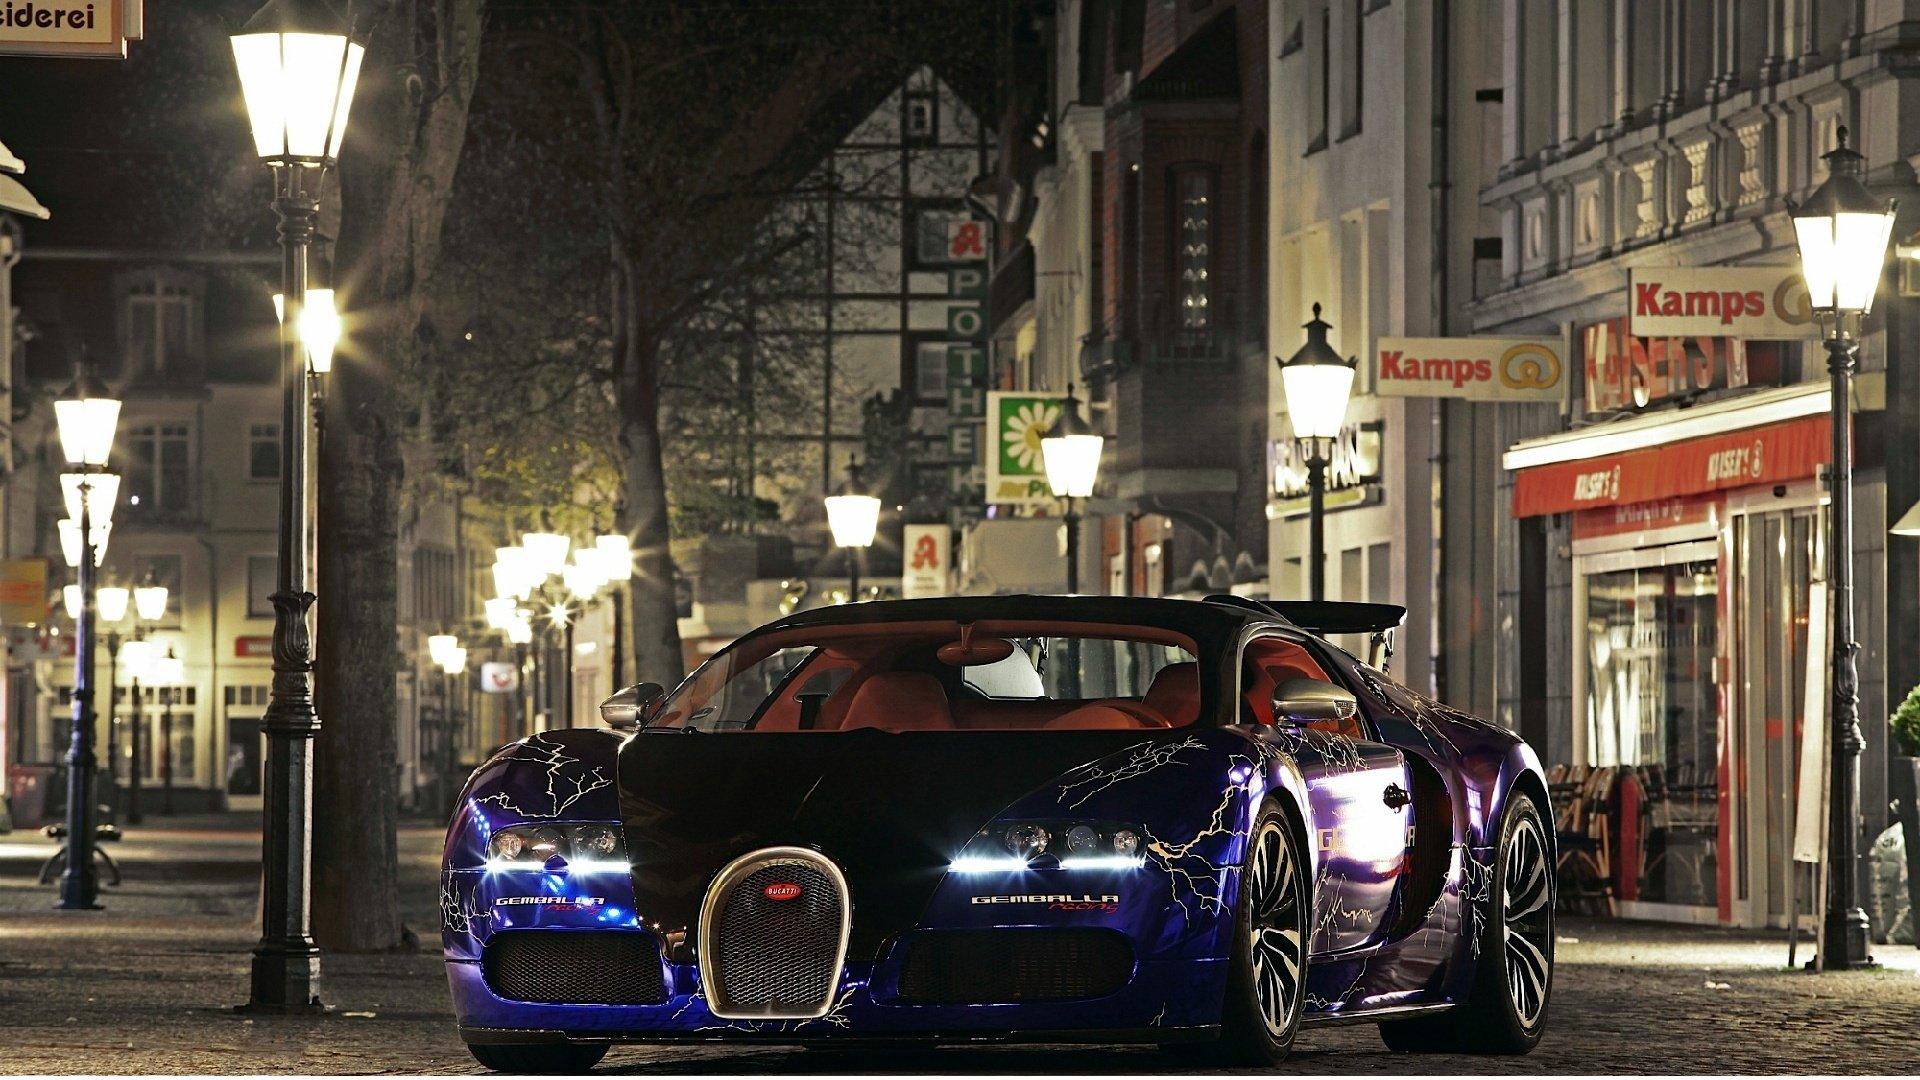 Download 1080p Bugatti Veyron Pc Wallpaper Id297978 For Free